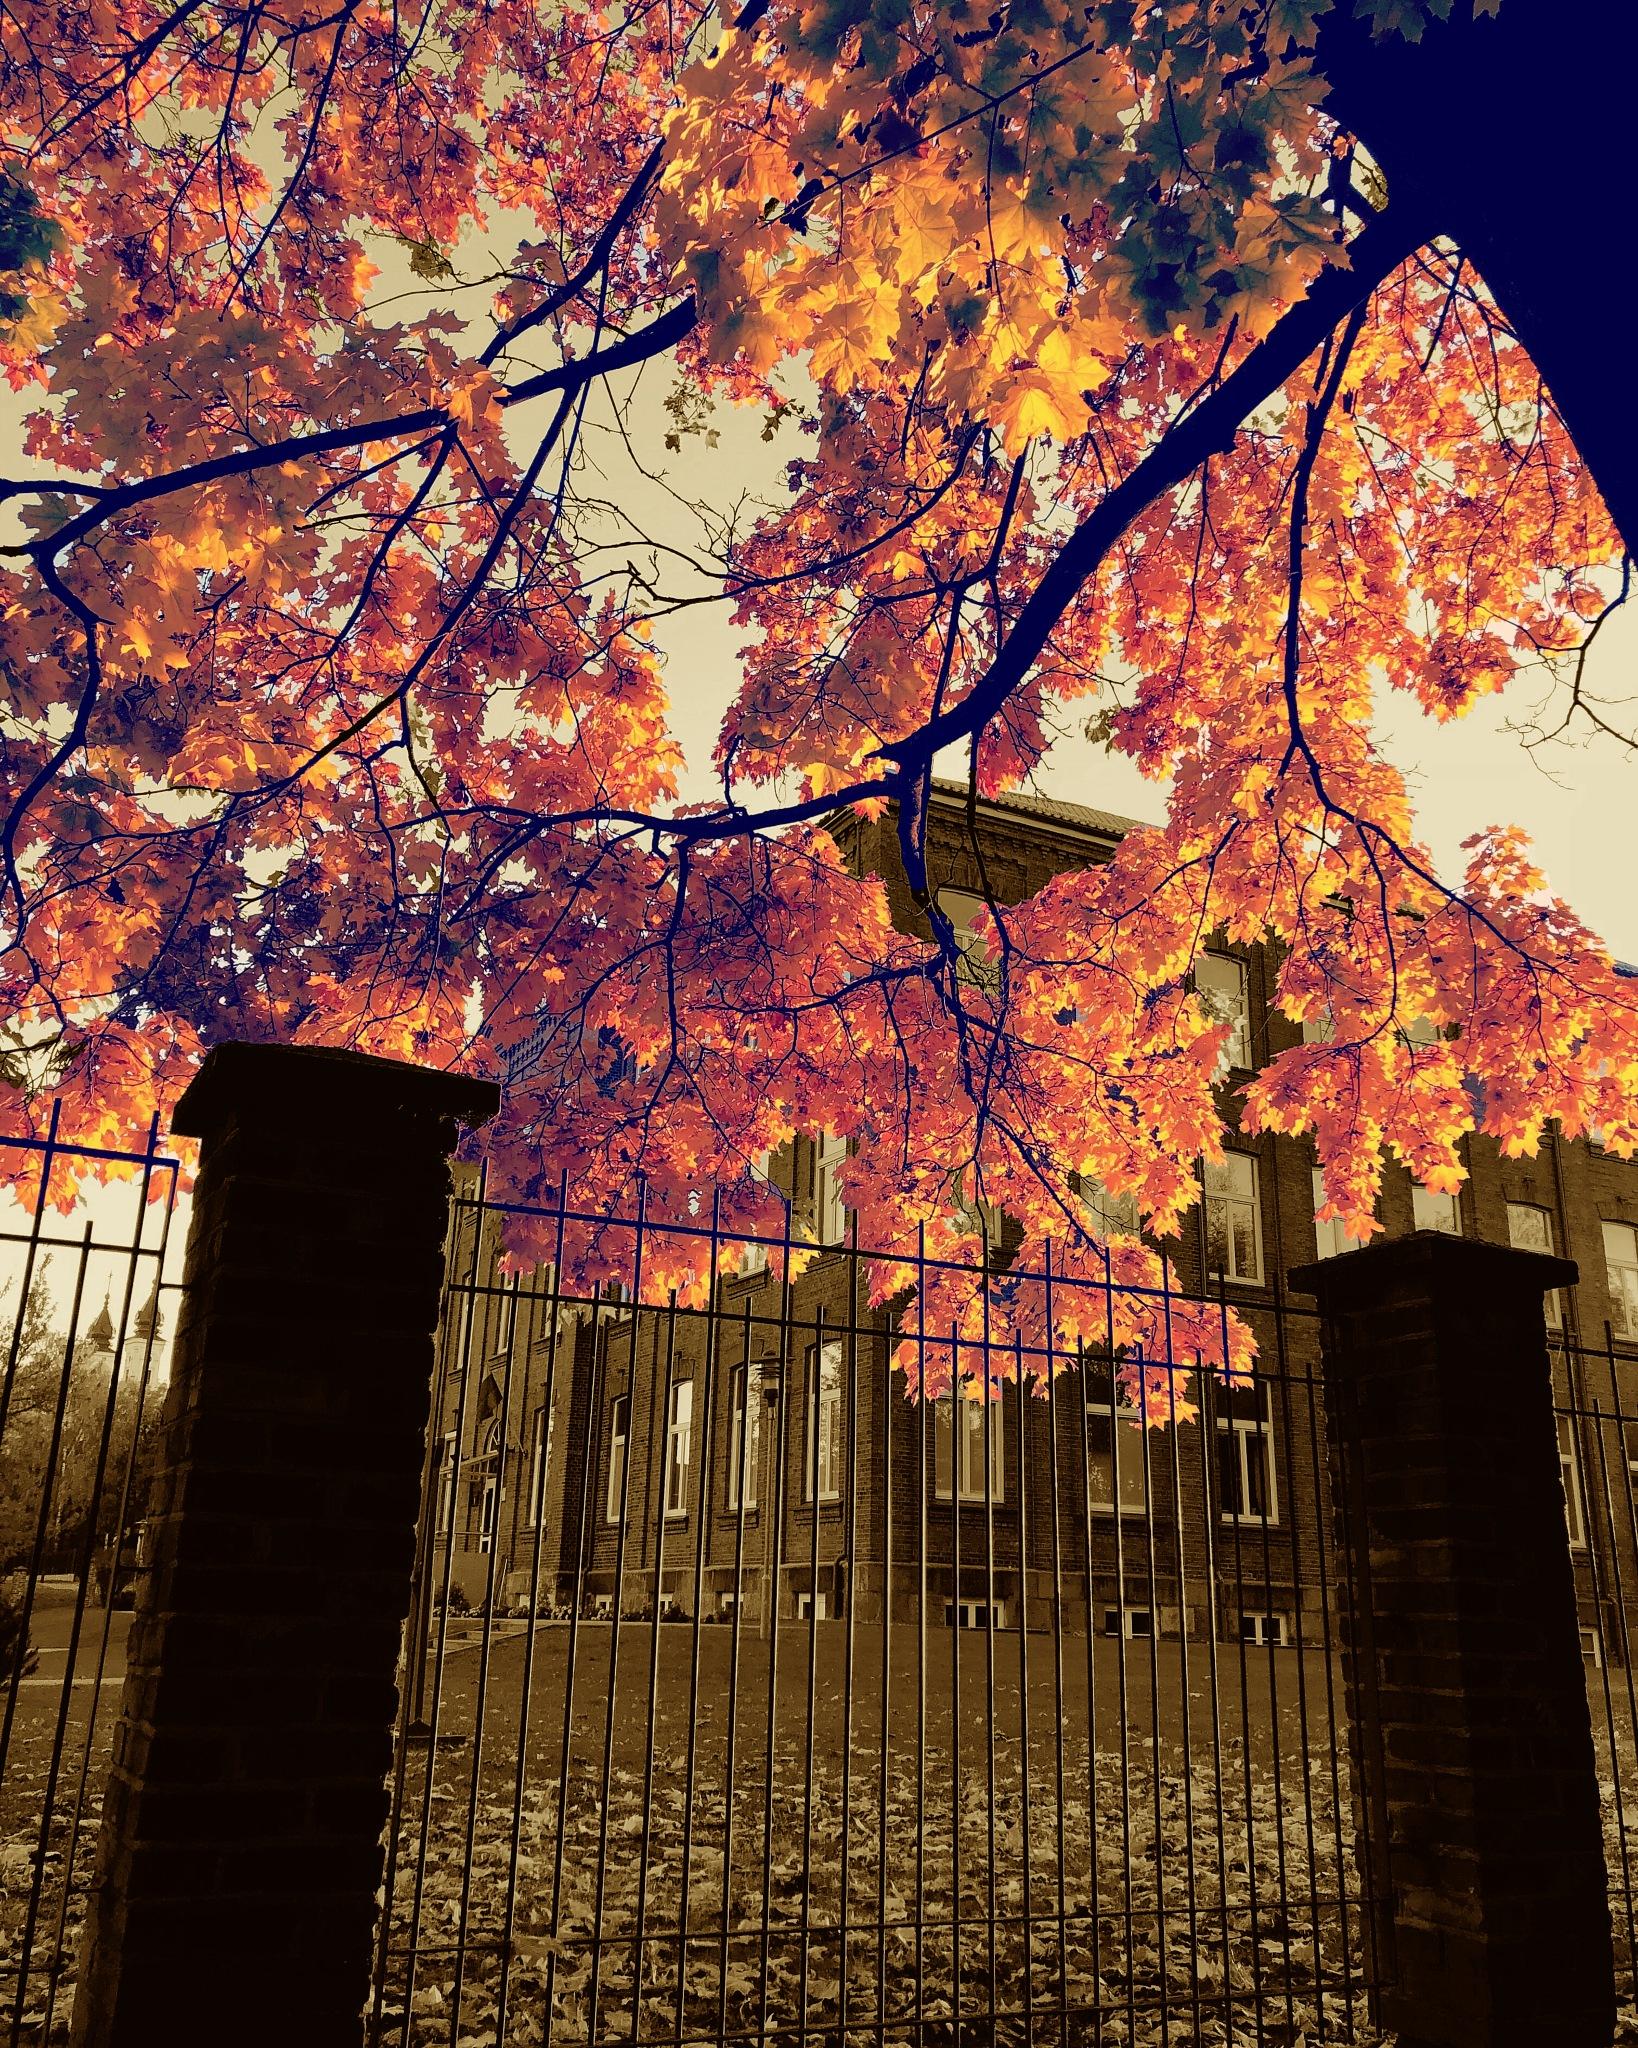 October by Edmundas Laukaitis